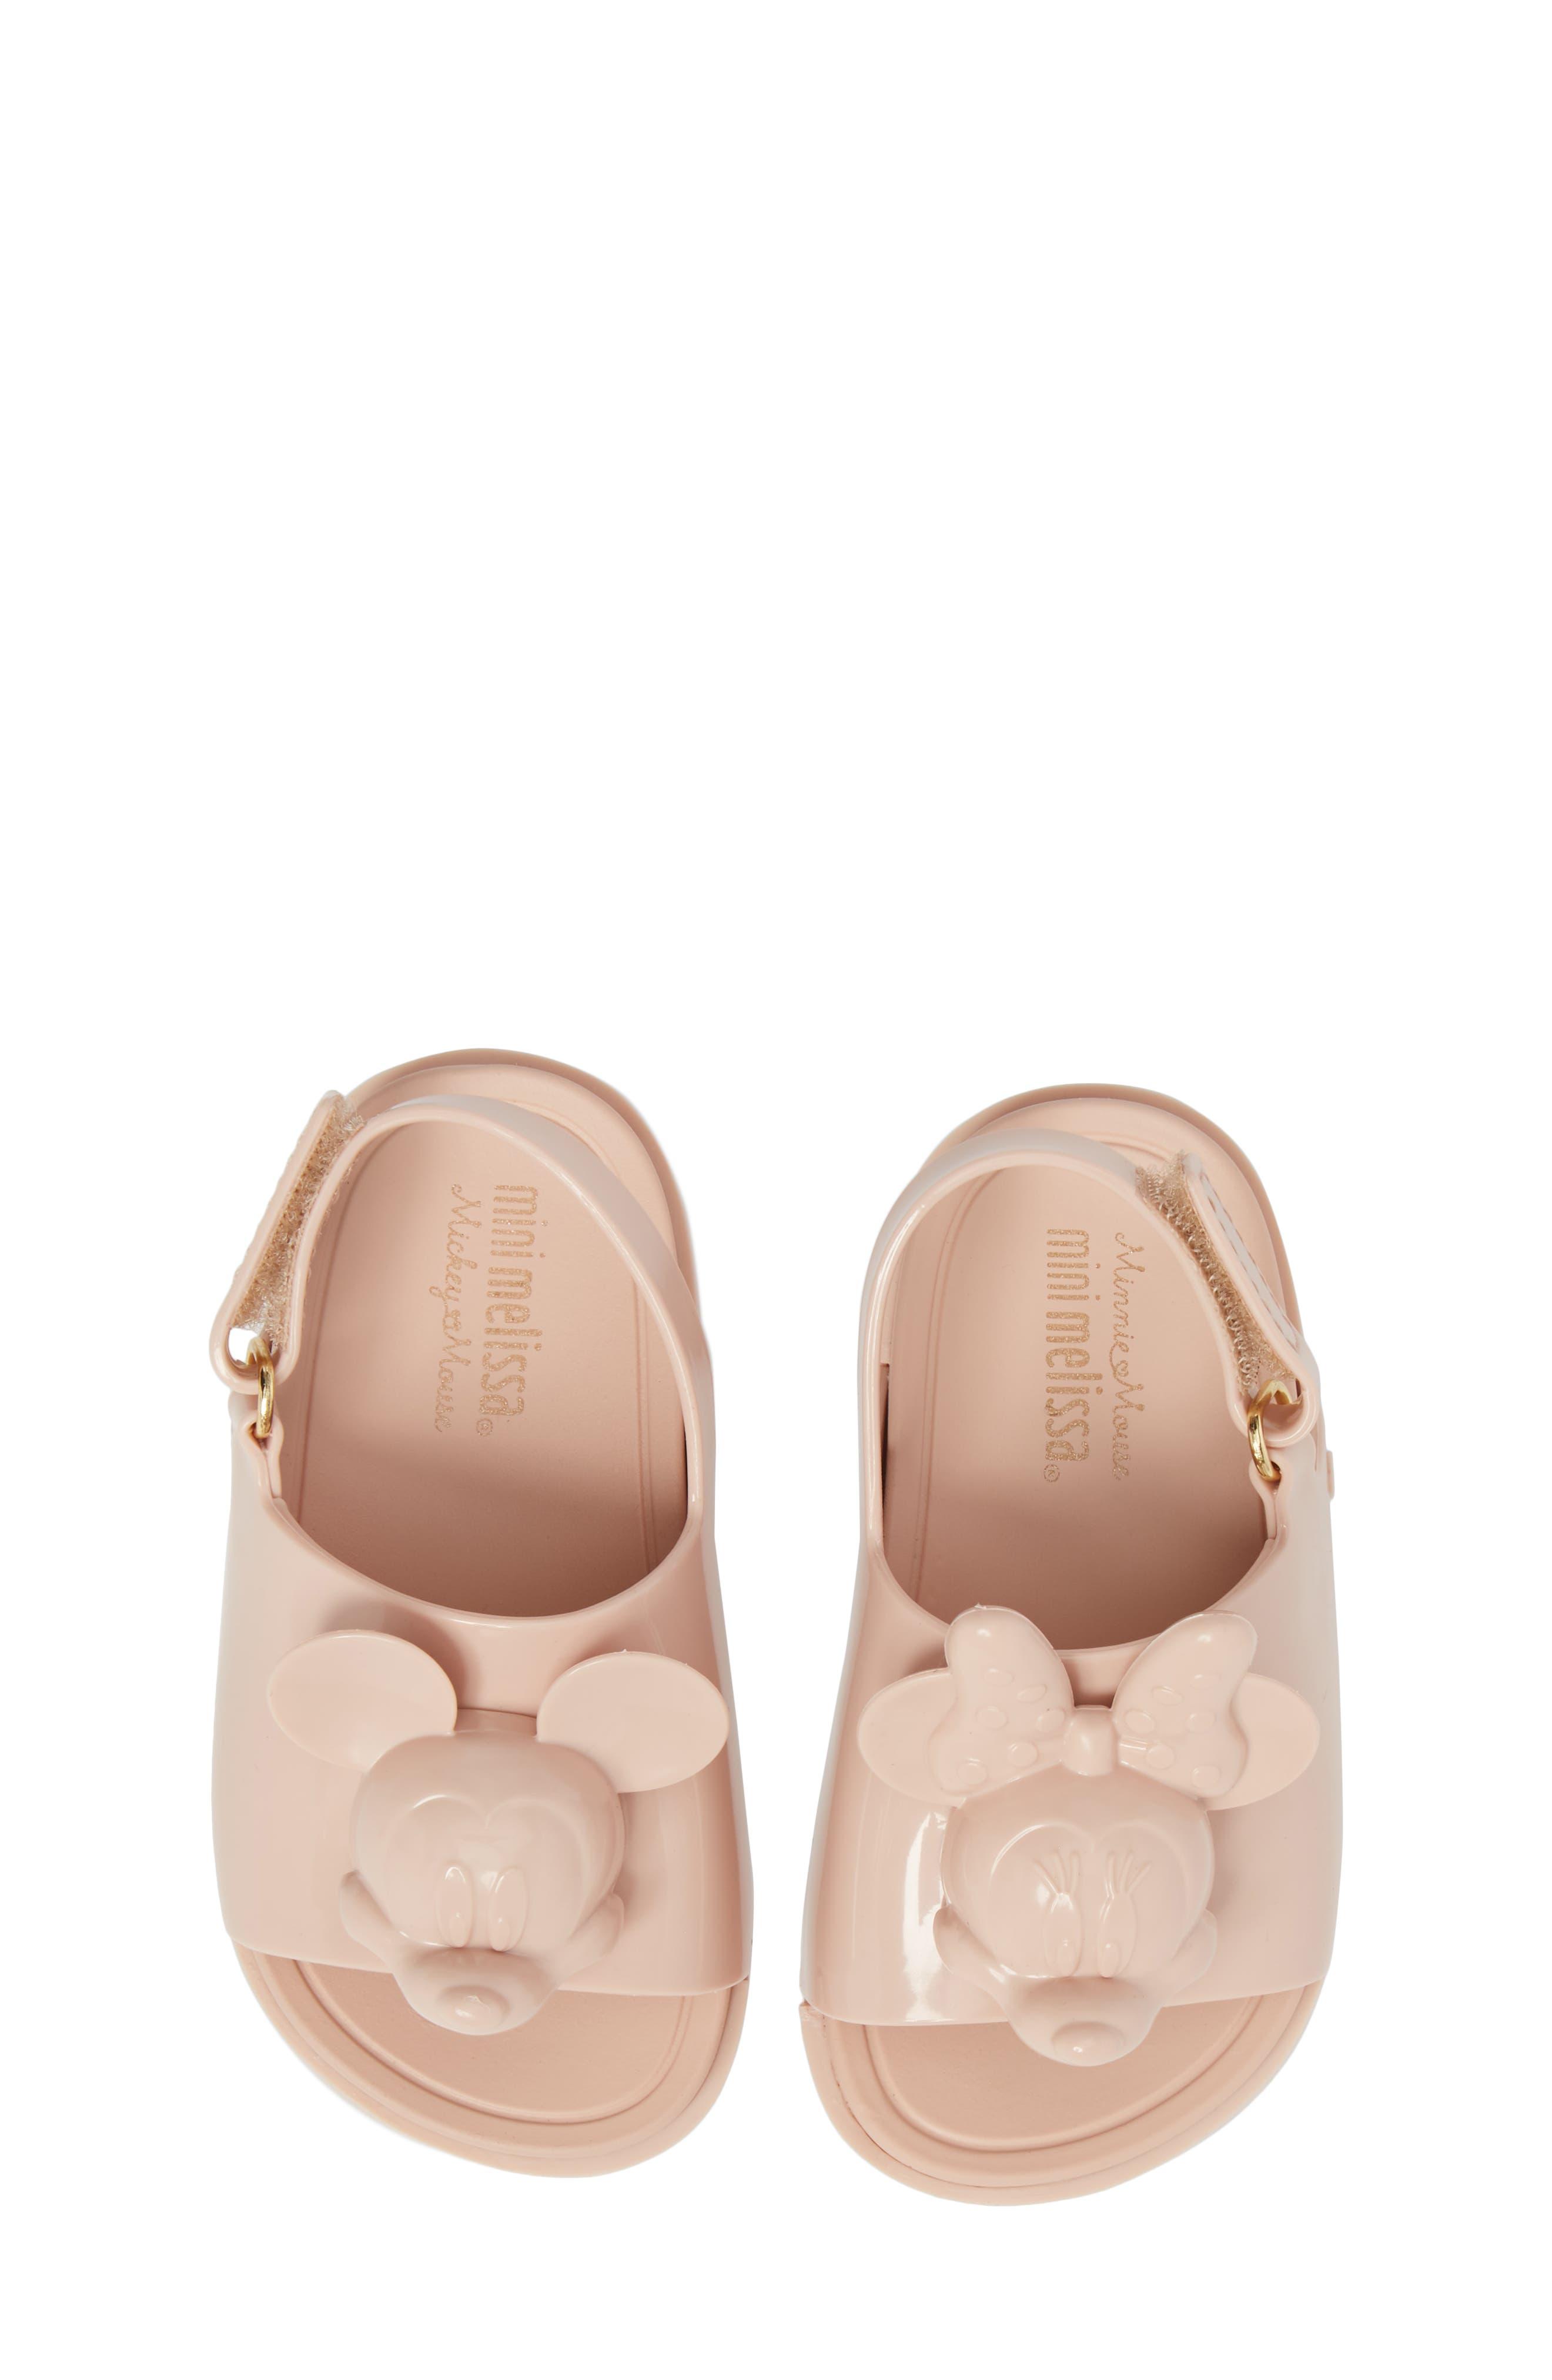 Disney<sup>®</sup> Mini Beach Sandal,                             Alternate thumbnail 20, color,